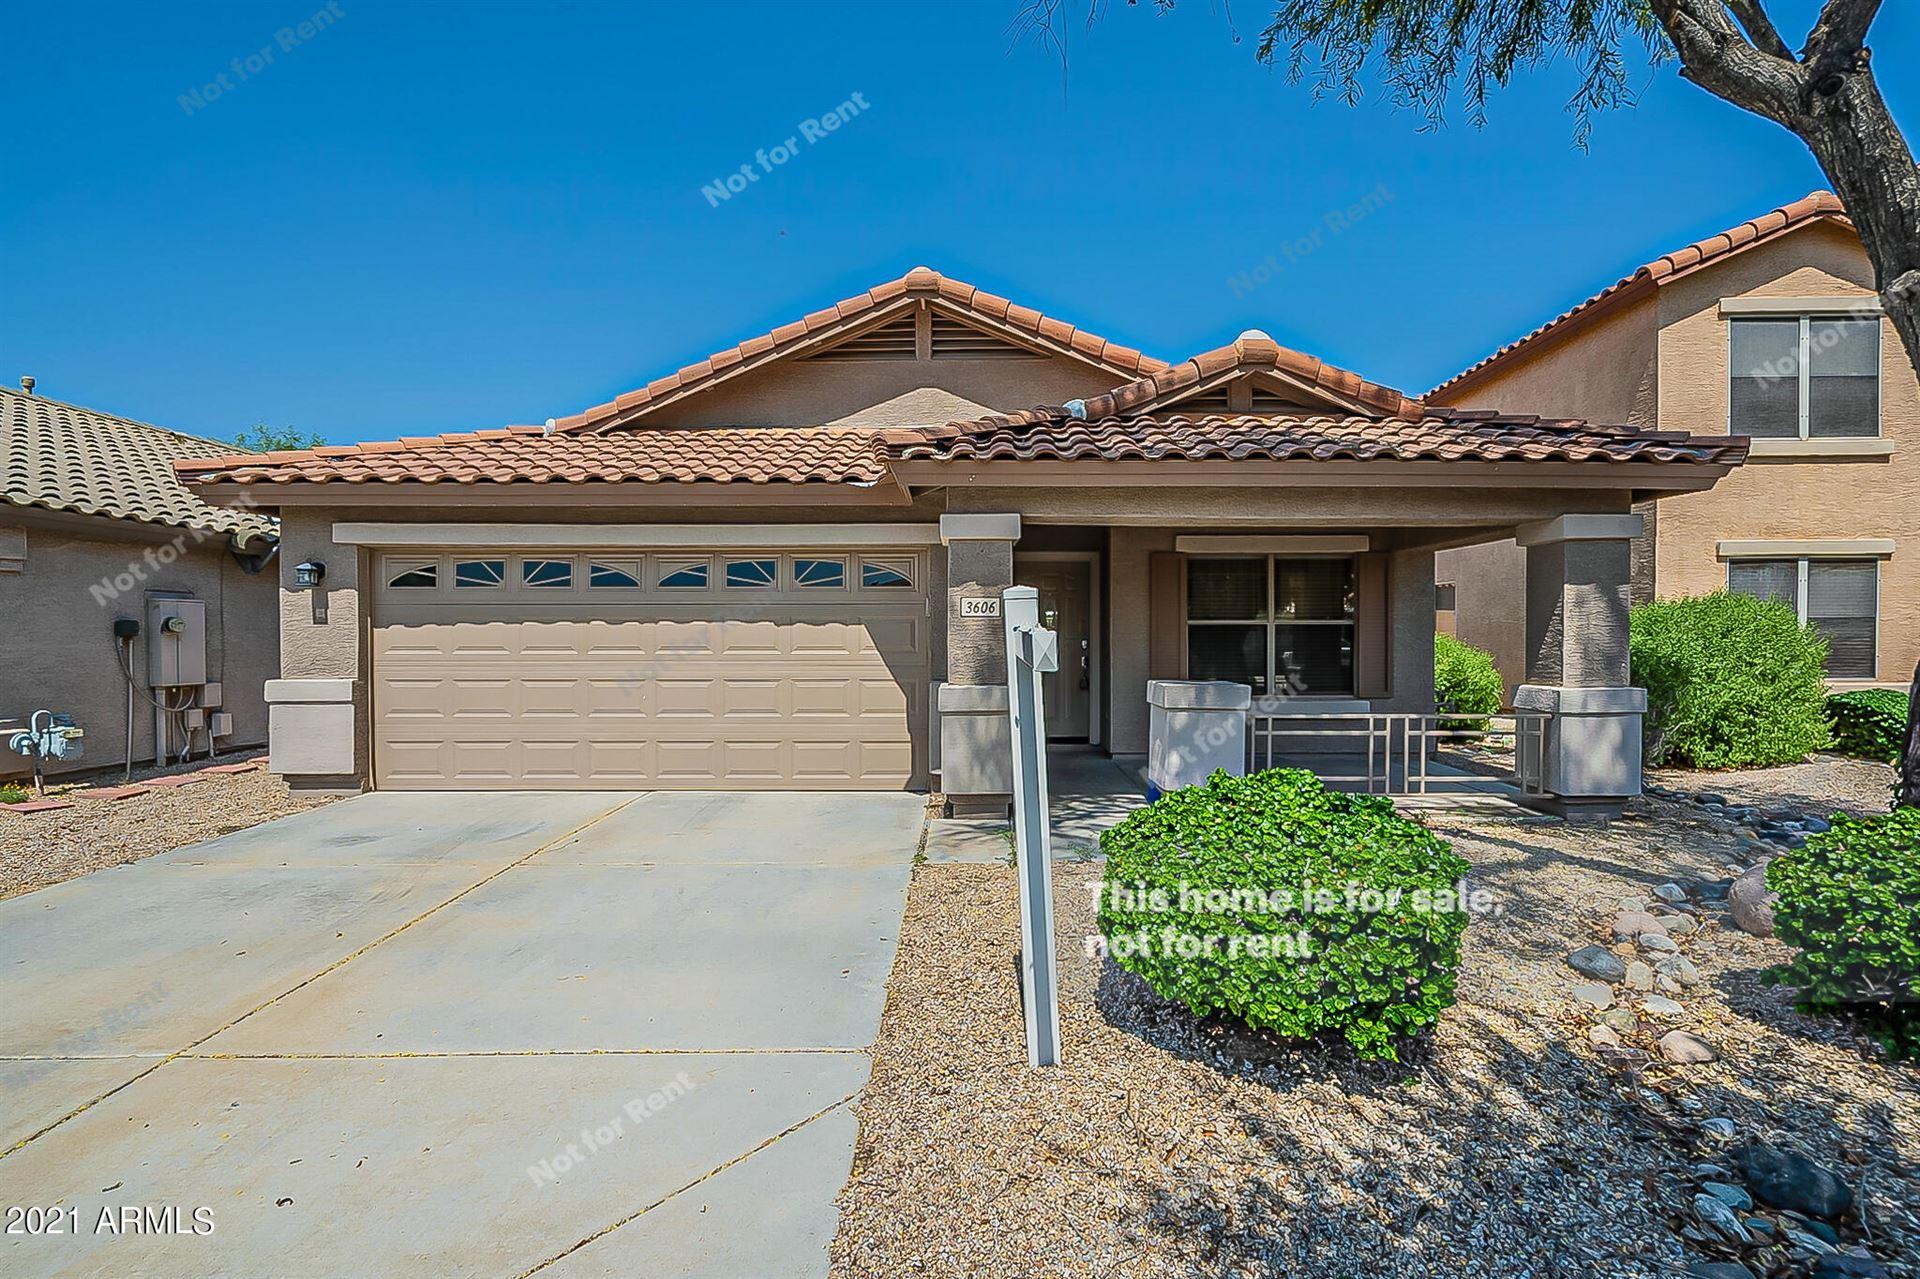 3606 E MONONA Drive, Phoenix, AZ 85050 - MLS#: 6291736